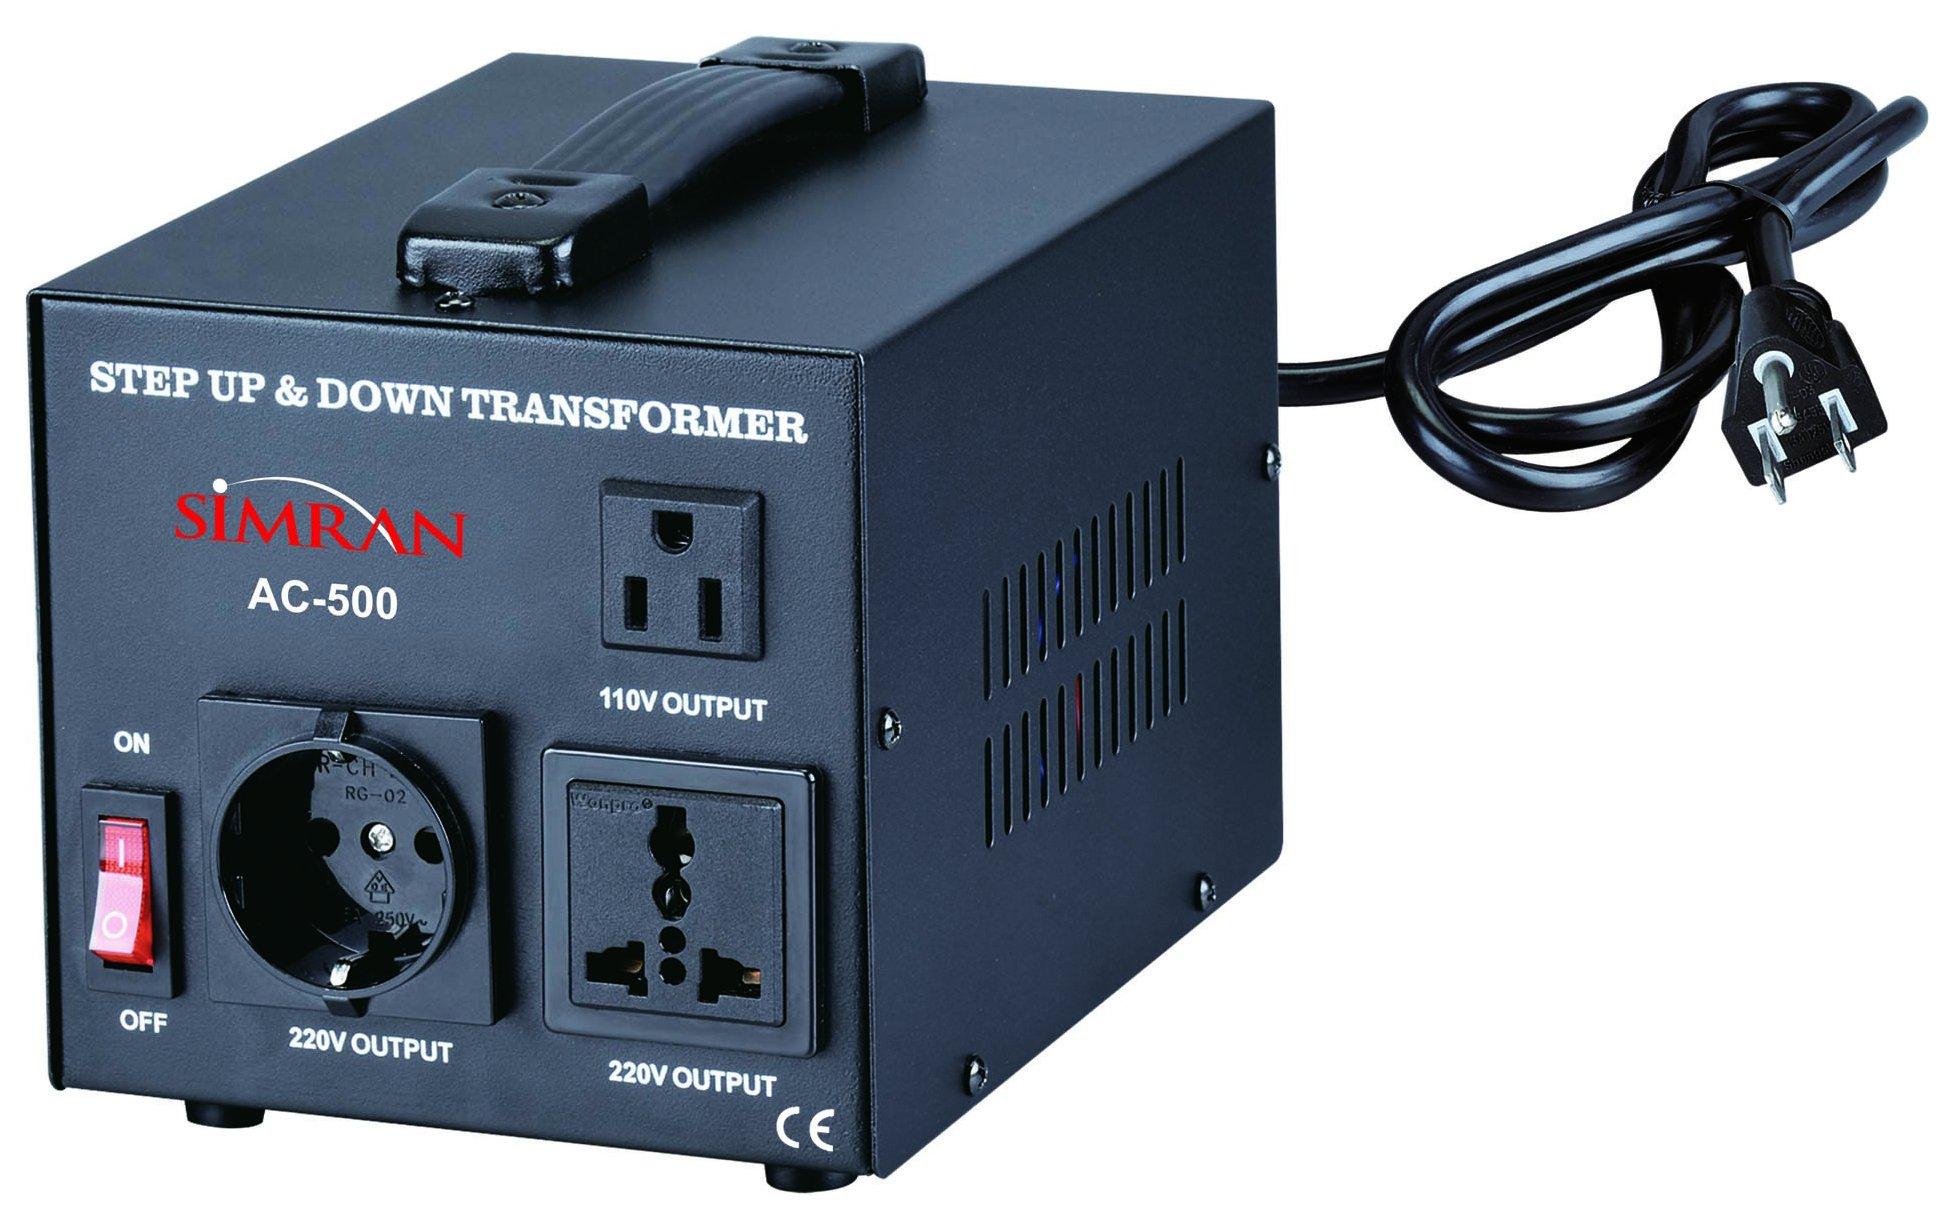 Simran Voltage Transformer, 500 Watt, Step up and Down, 110 Volt, 220 Volt Power Converter, Black (ACN-500)